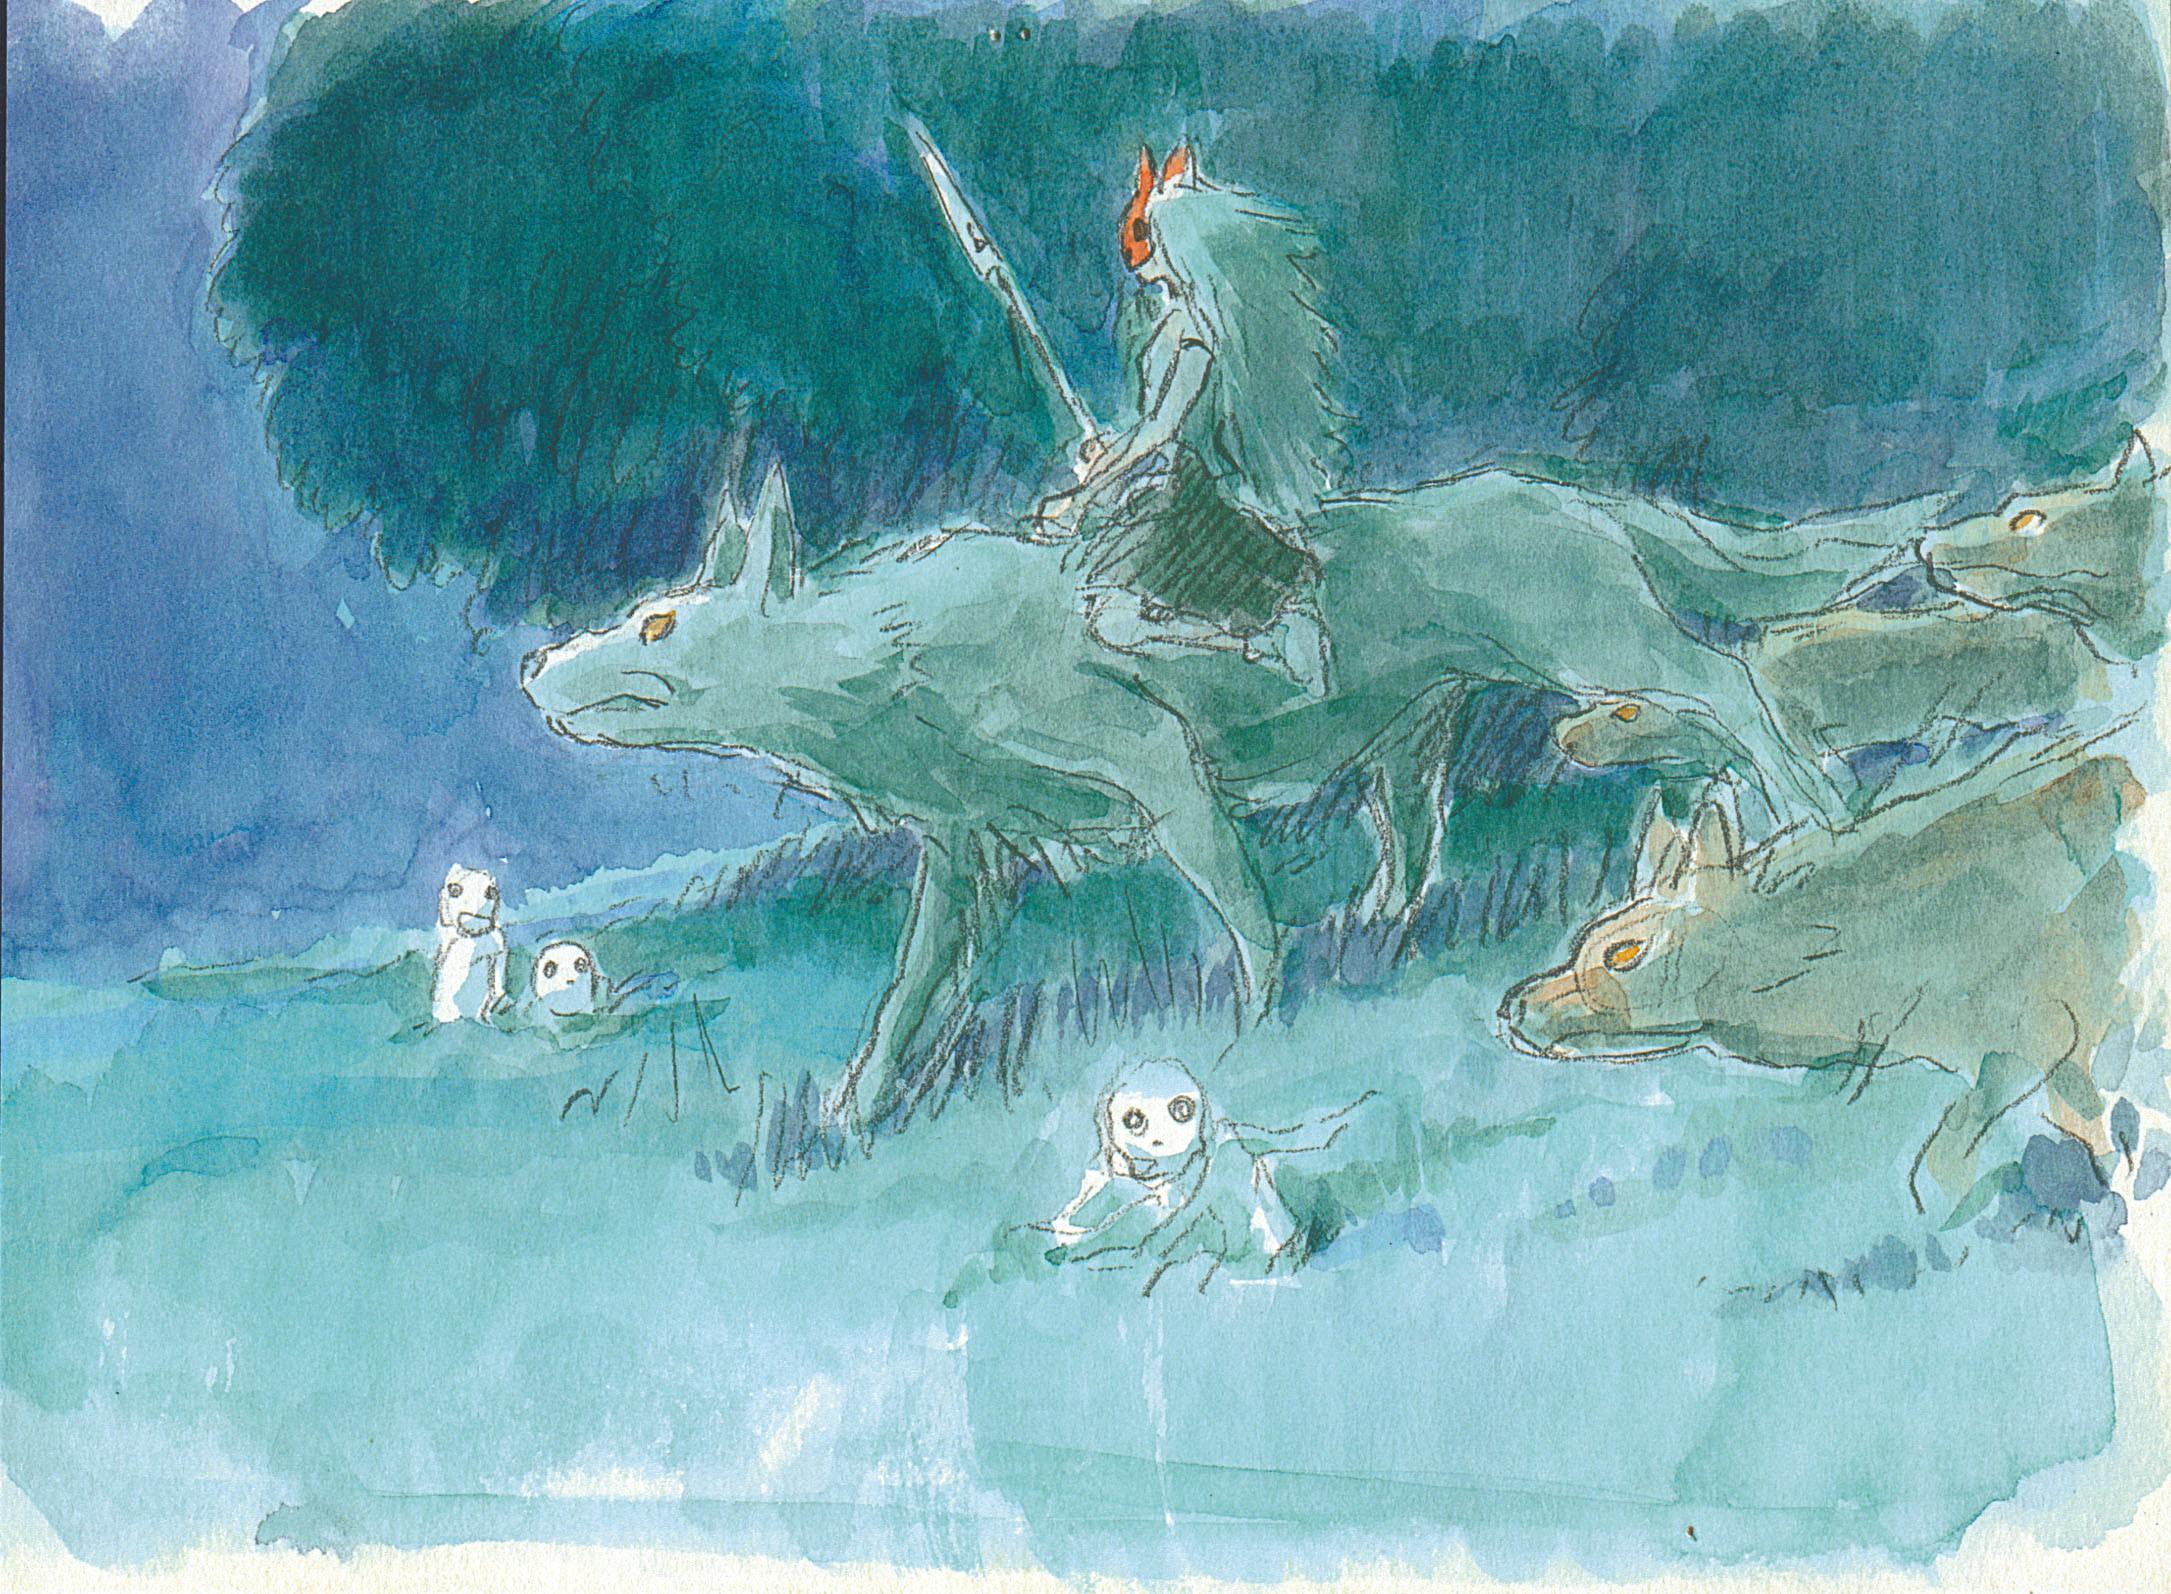 Wallpaper Drawing Painting Illustration Artwork Princess Mononoke Studio Ghibli Ashitaka Material Sketch Wind Wave Acrylic Paint Watercolor Paint 2171x1594 Miragrok 180228 Hd Wallpapers Wallhere